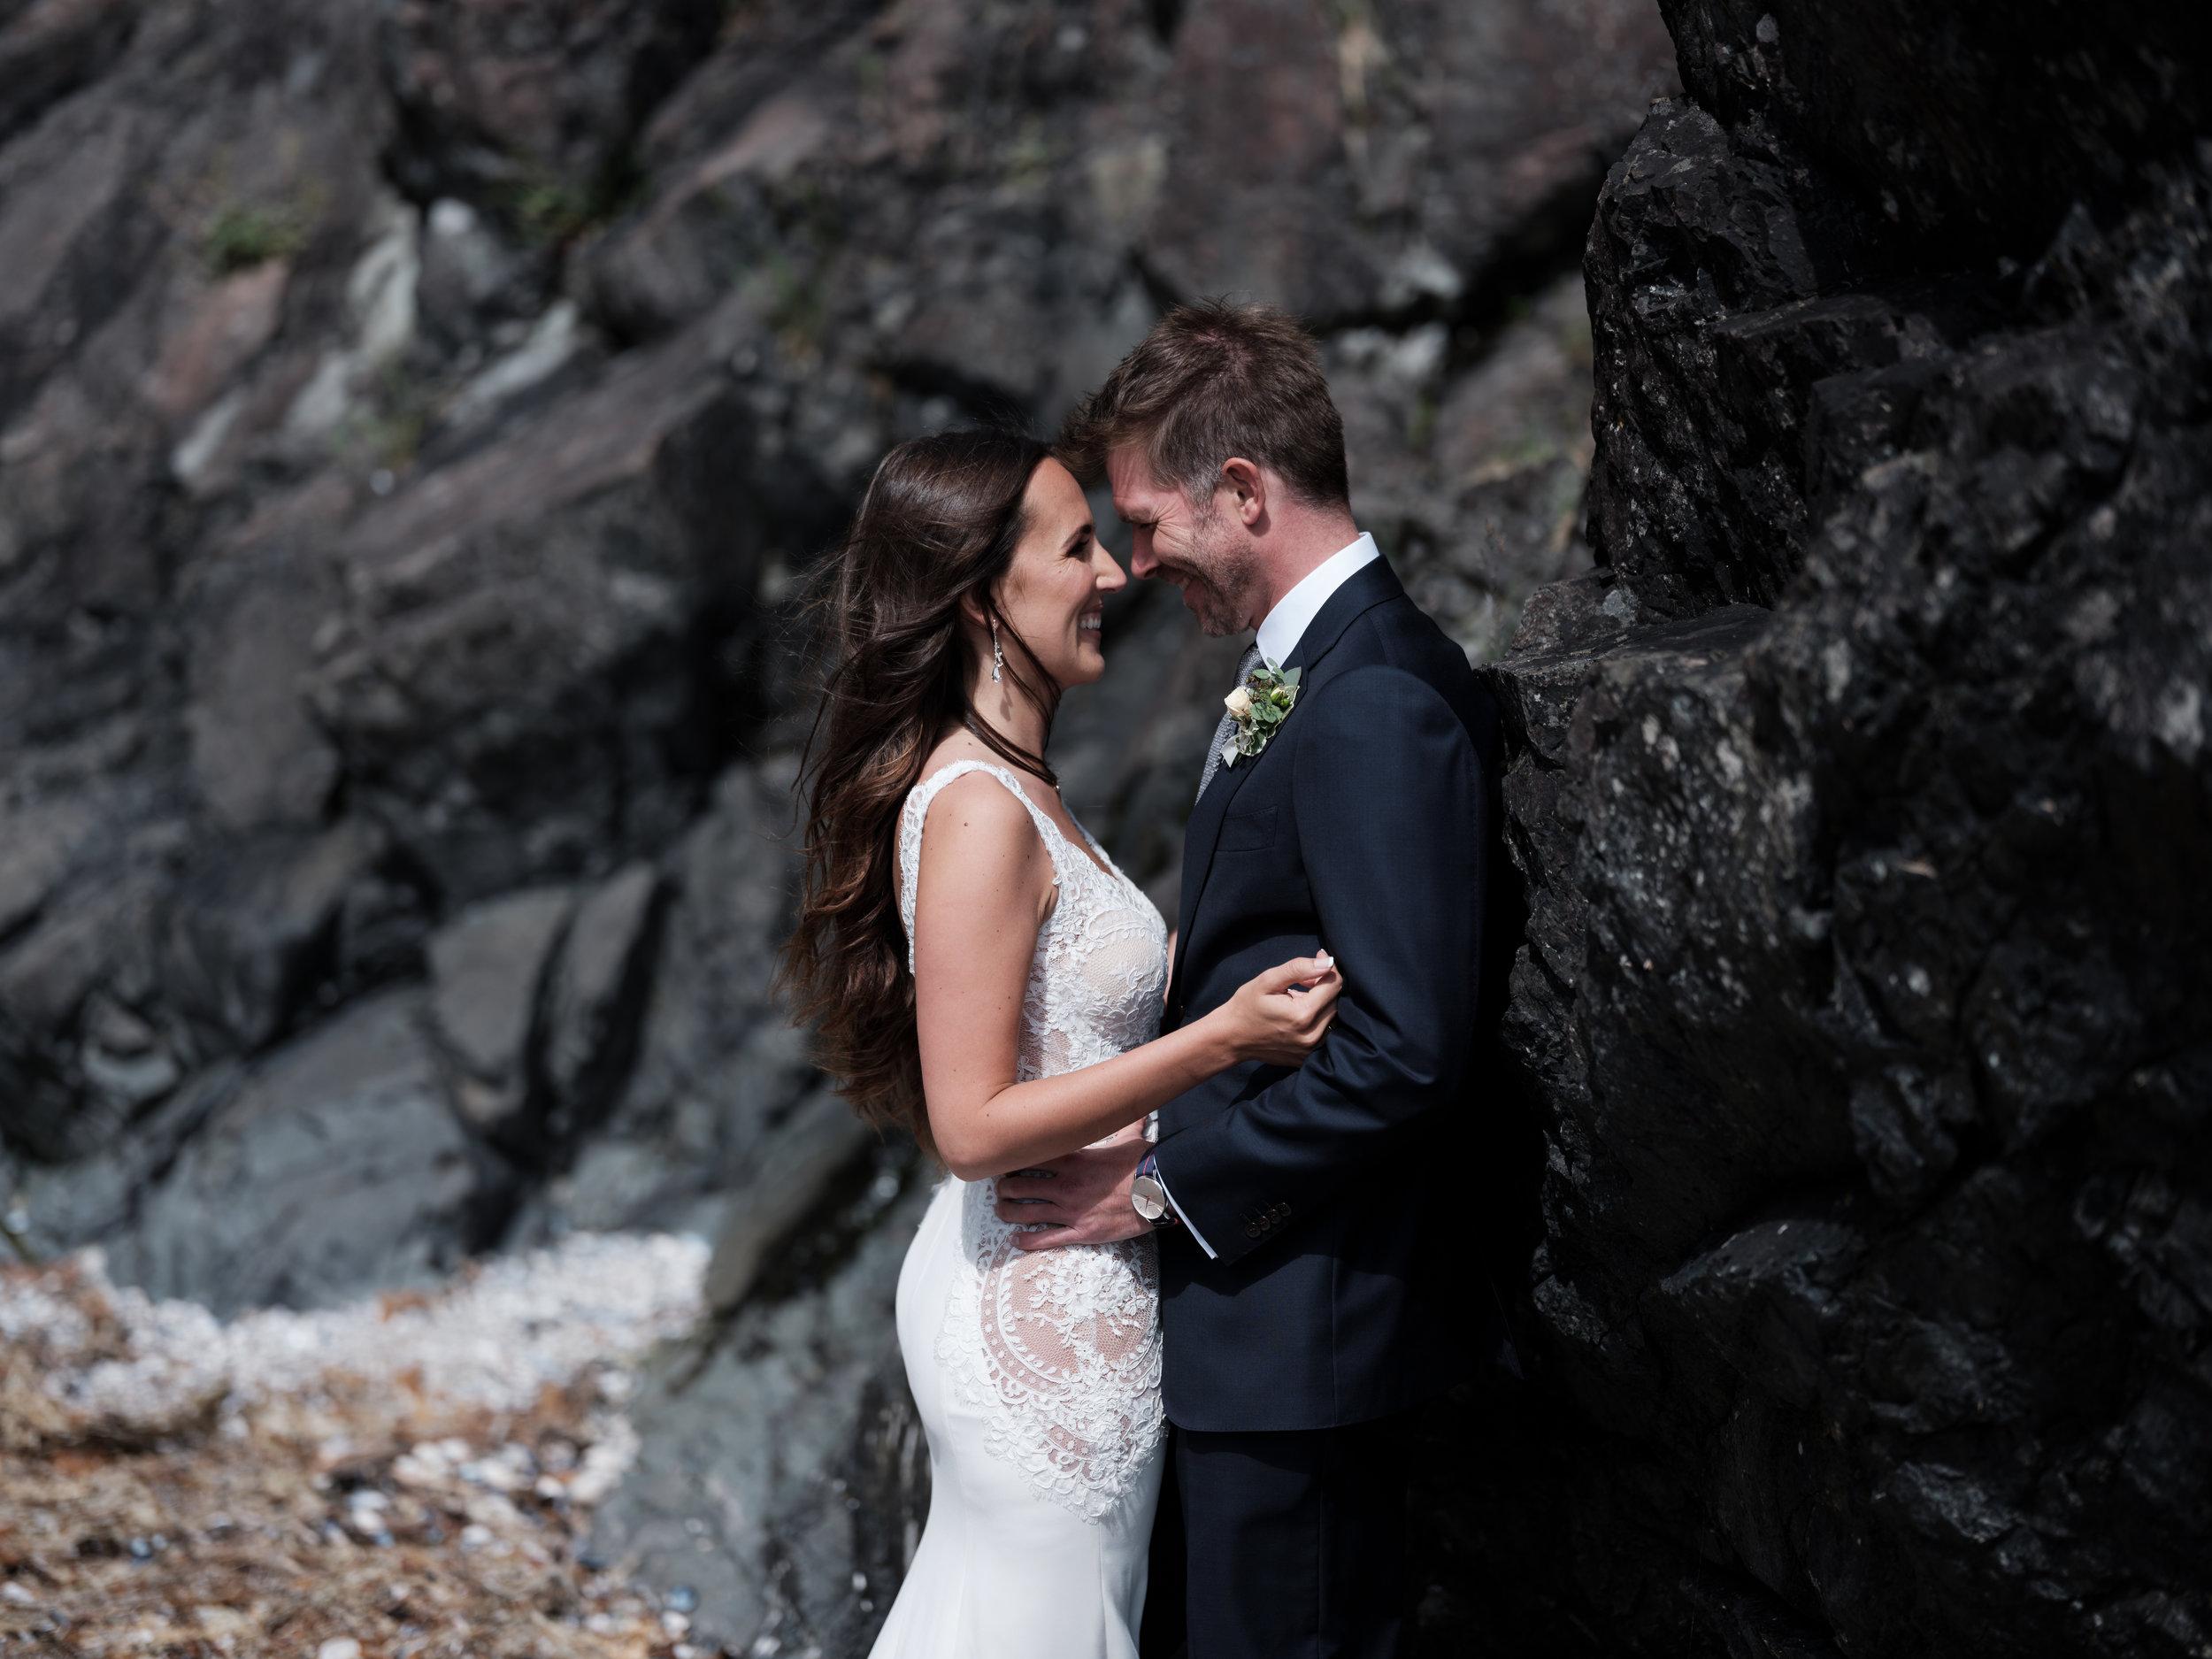 tofino ucluelet wedding engagement photographer photography PLP_18_06_CarlaGreg-166.jpg